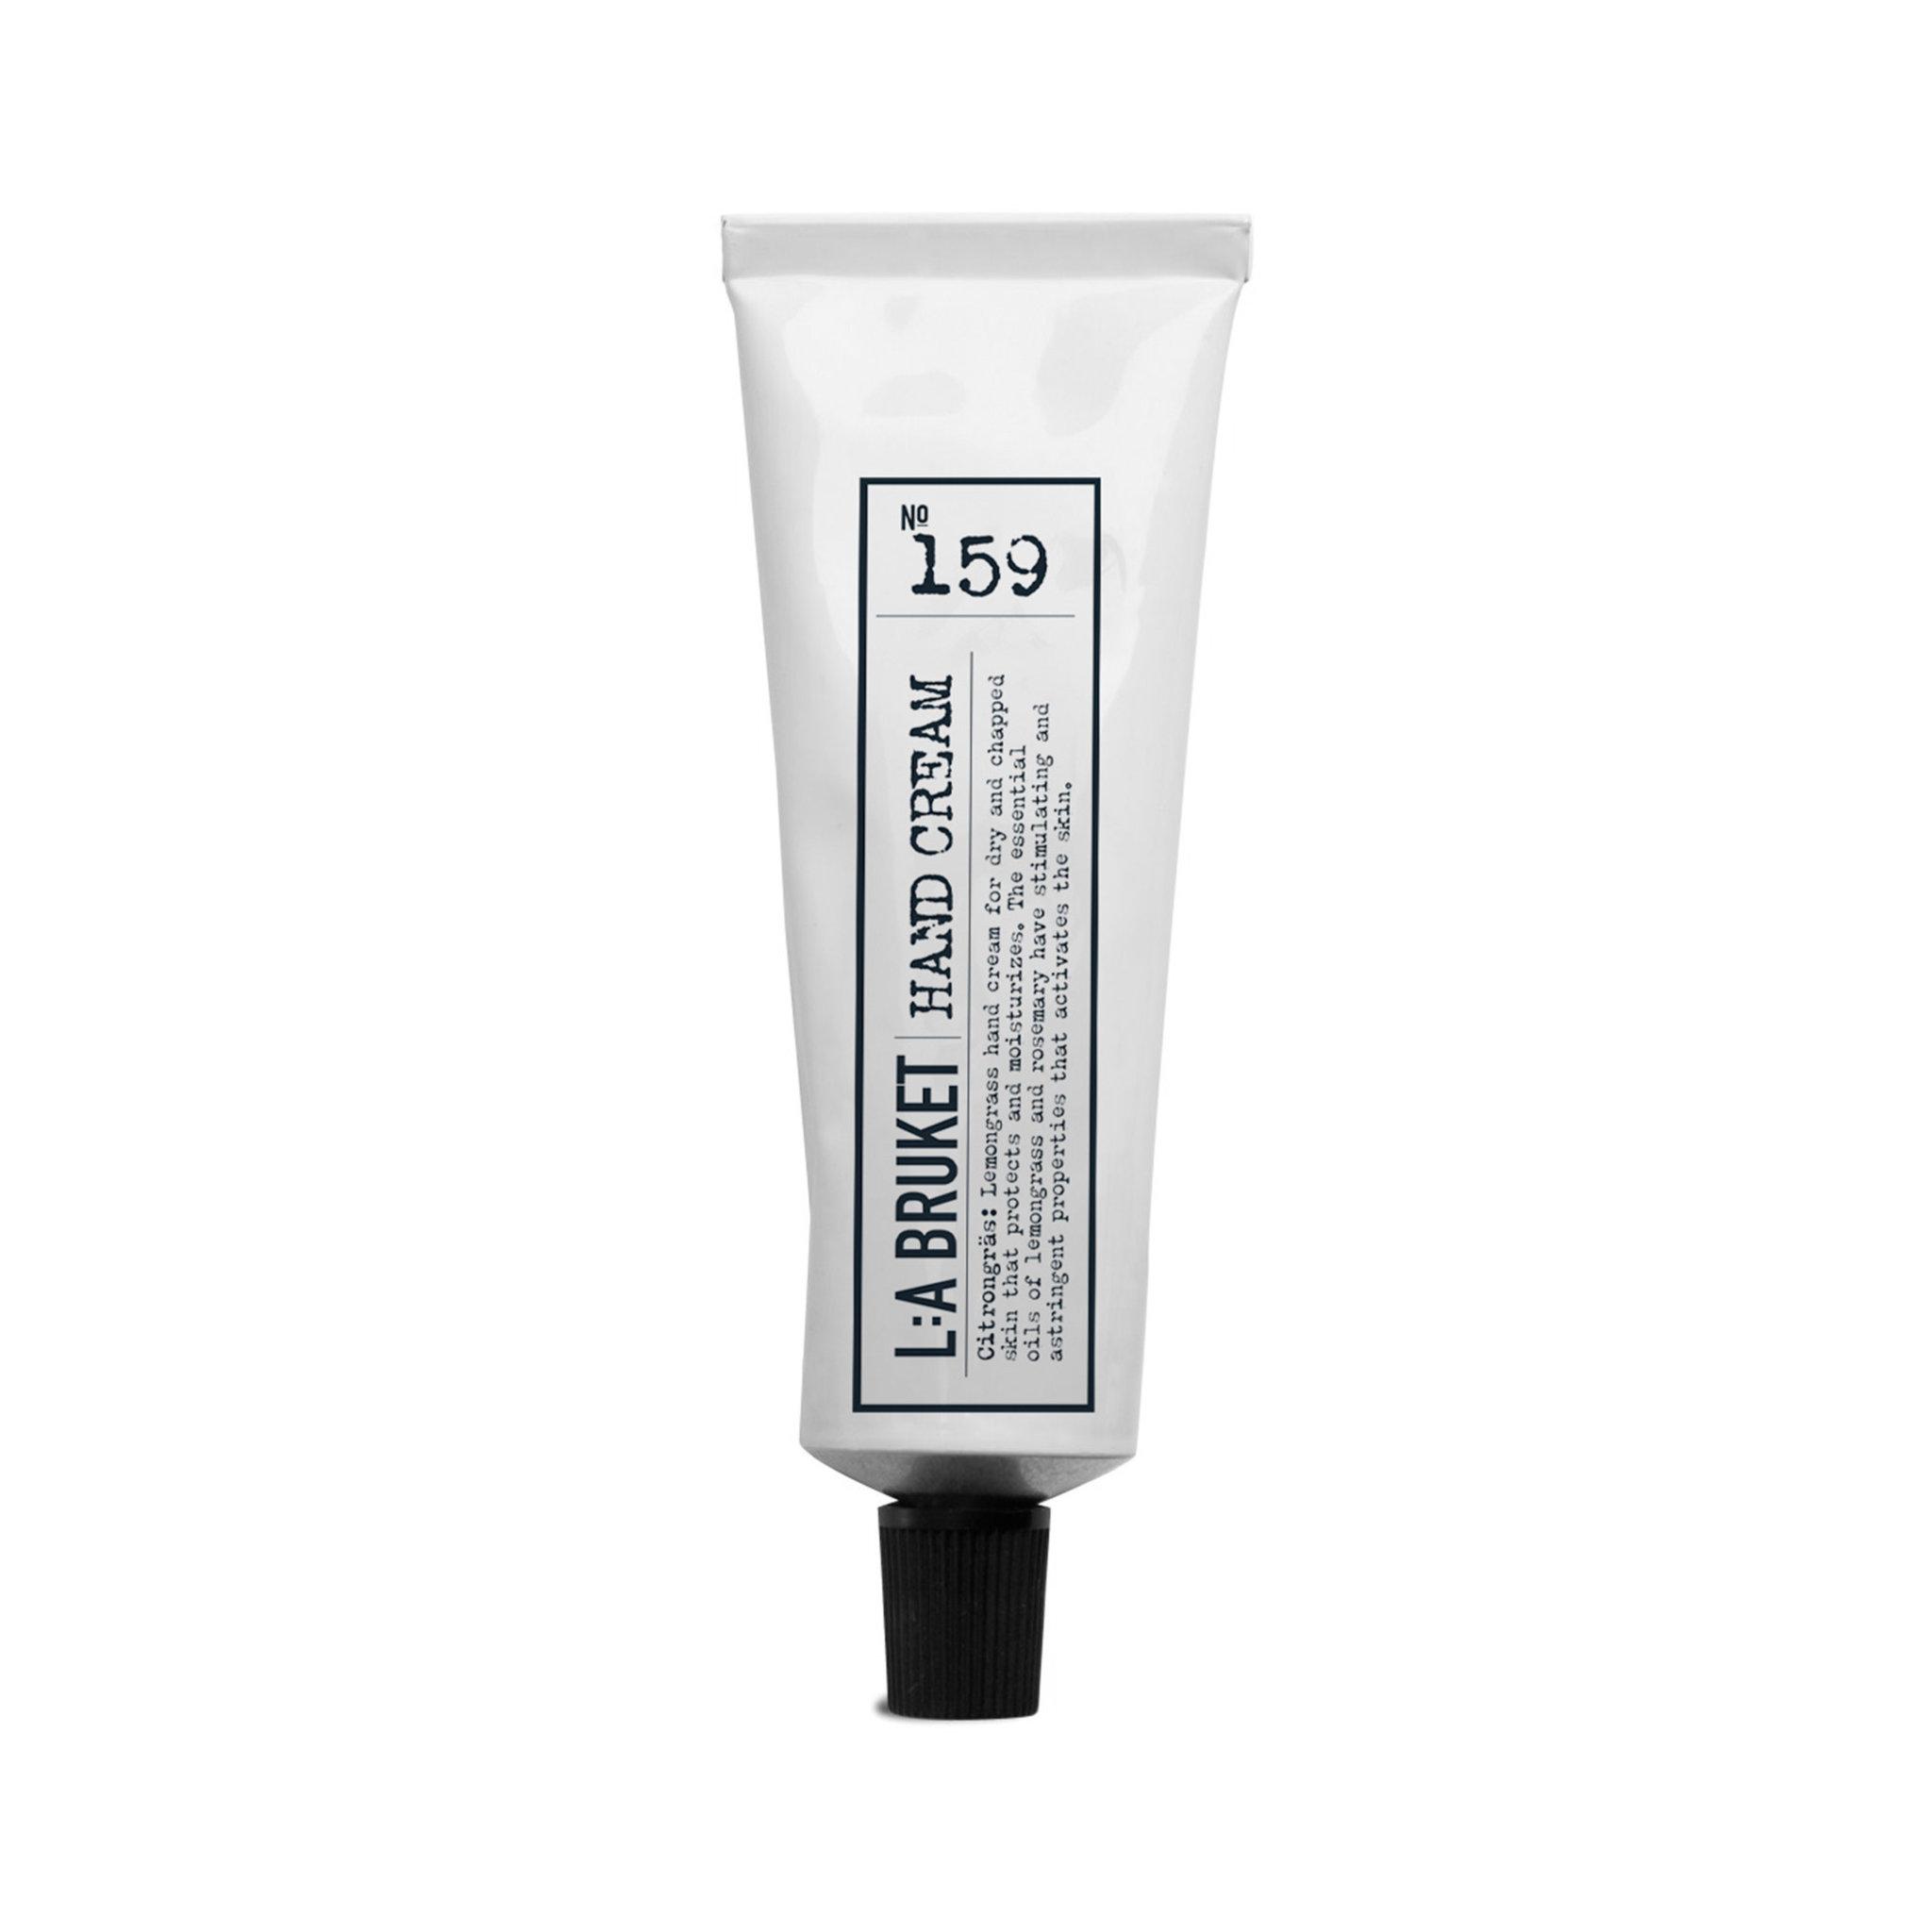 L:A Bruket Hand Cream Citrongräs 159